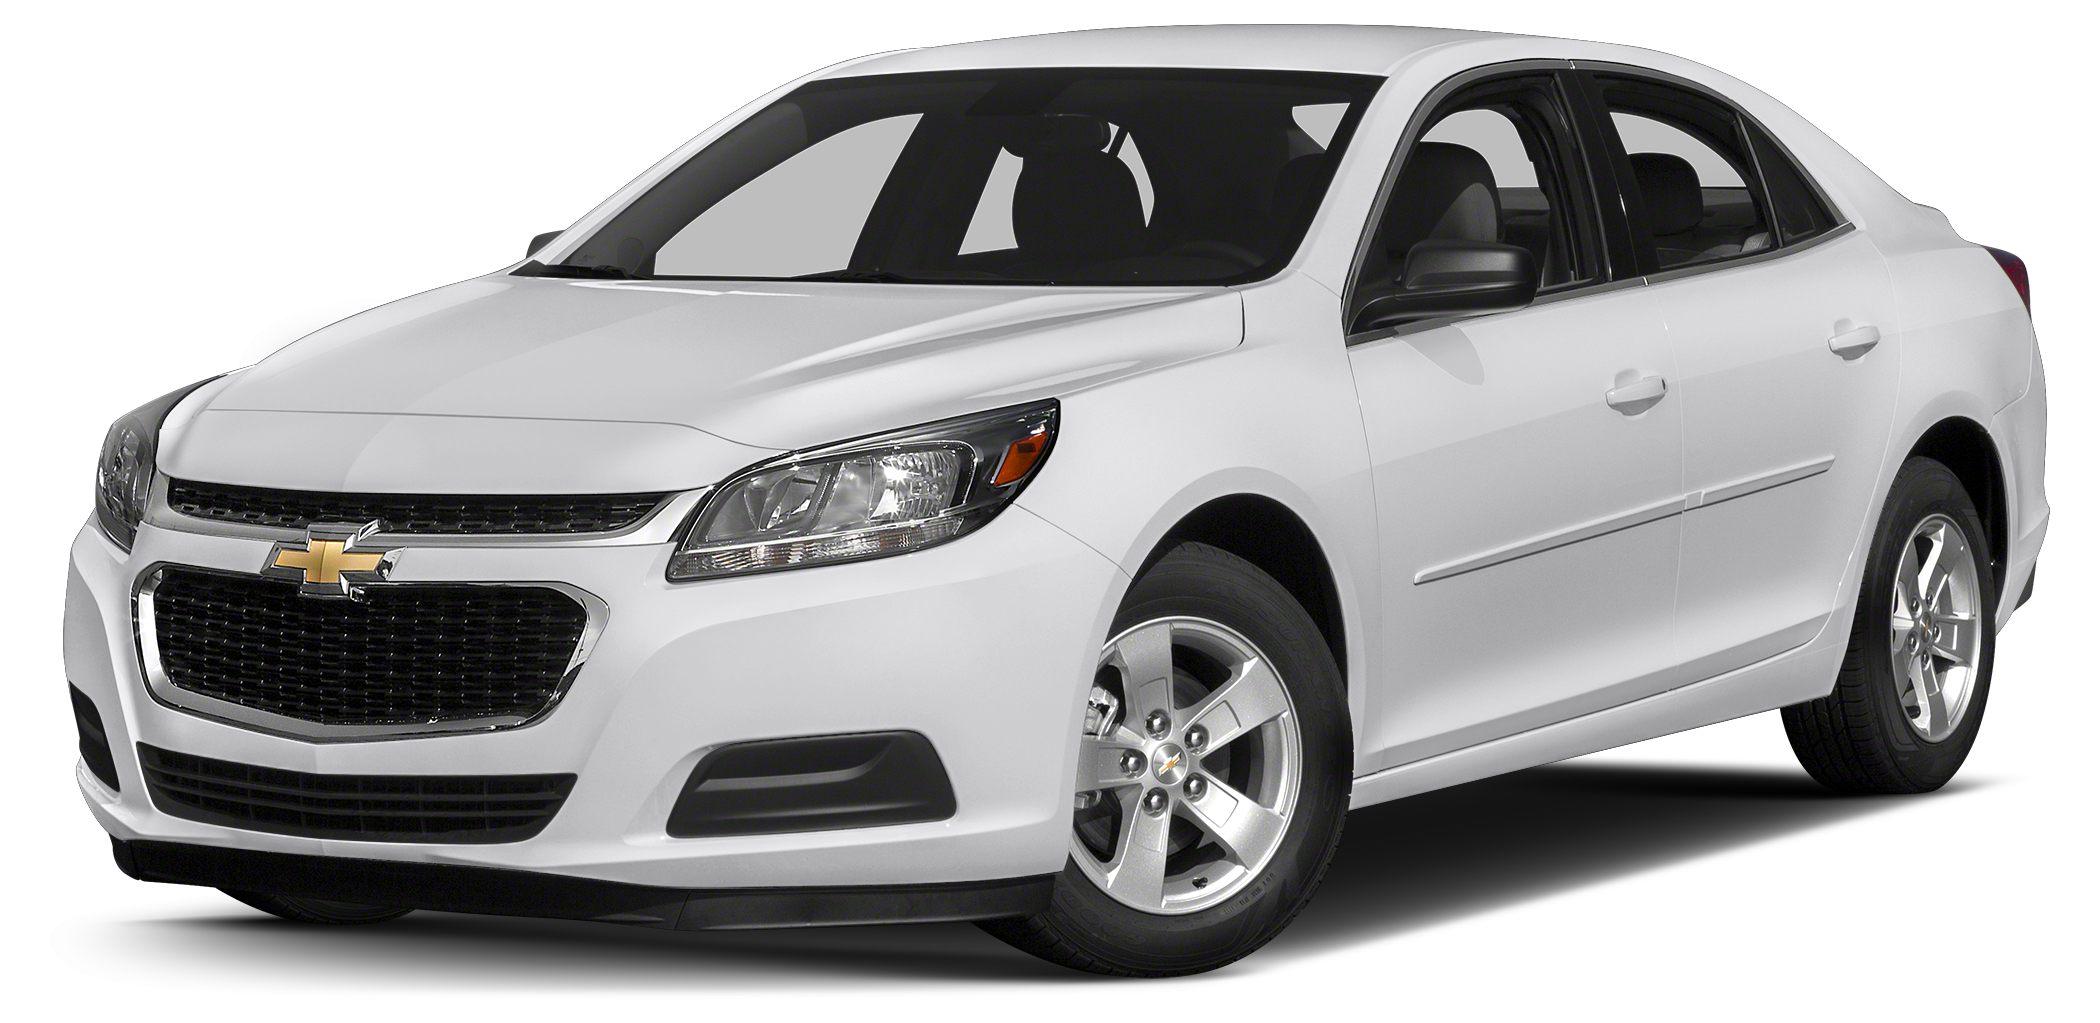 2015 Chevrolet Malibu LTZ w1LZ Miles 27998Color Silver Stock U2267 VIN 1G11F5SL8FF173433